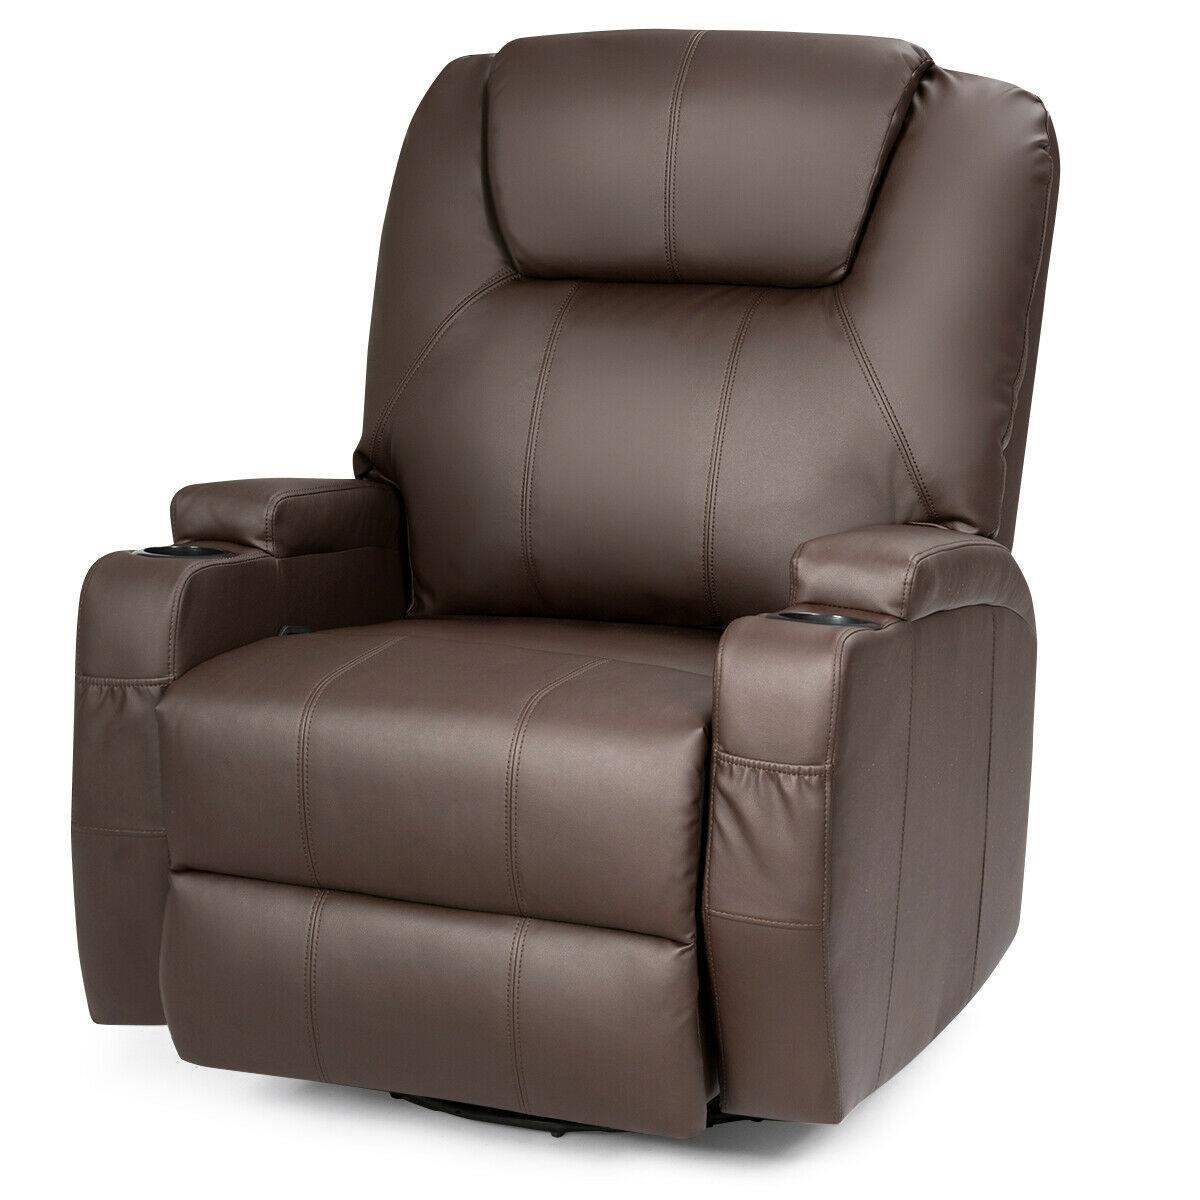 8 Heated Swivel Point Massage Recliner Chair